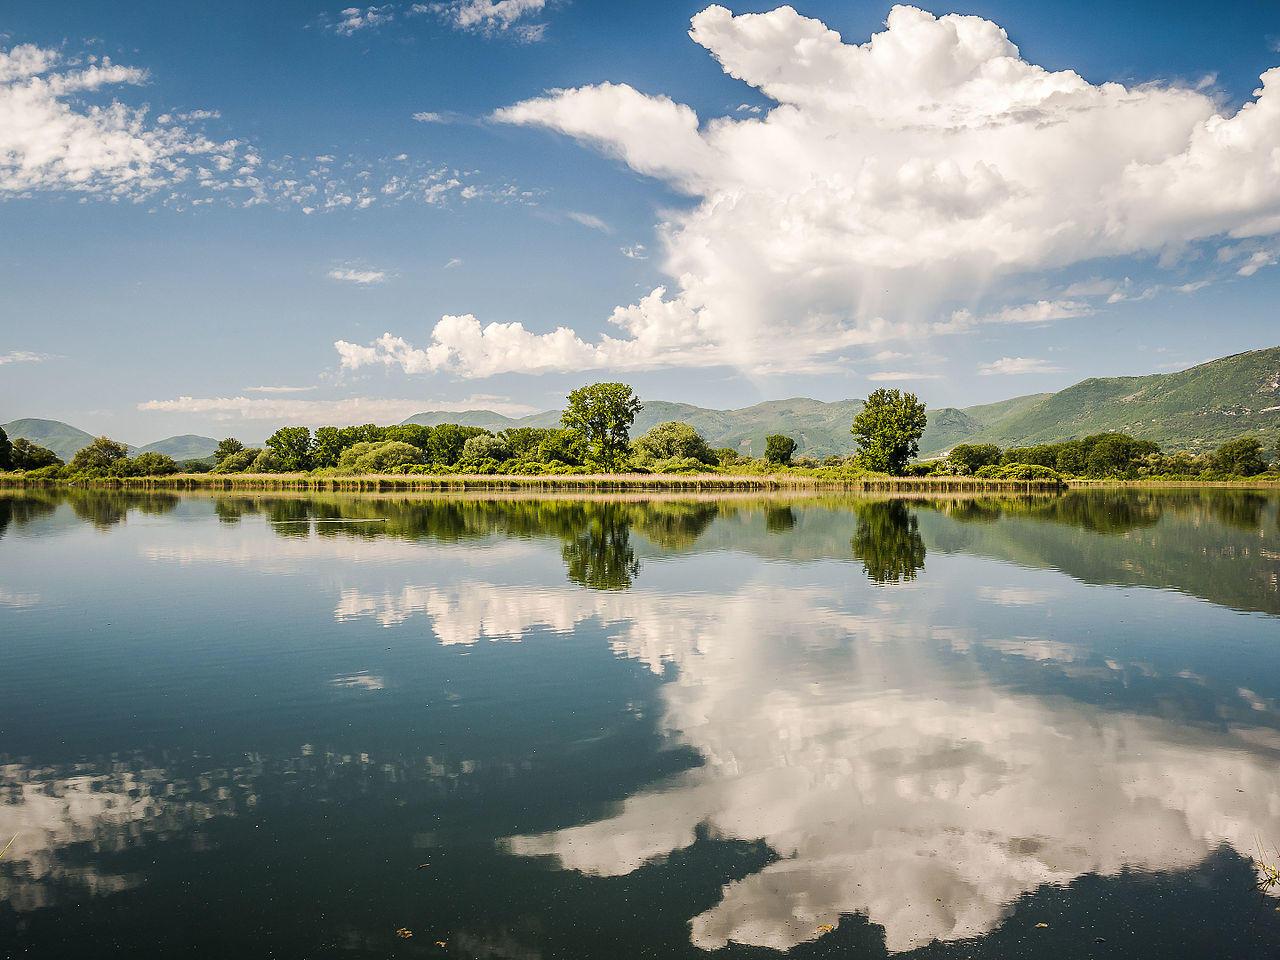 Il Lago Lungo, provinsen Rieti i regionen Lazio. Bildet er hentet fra Wikimedia.